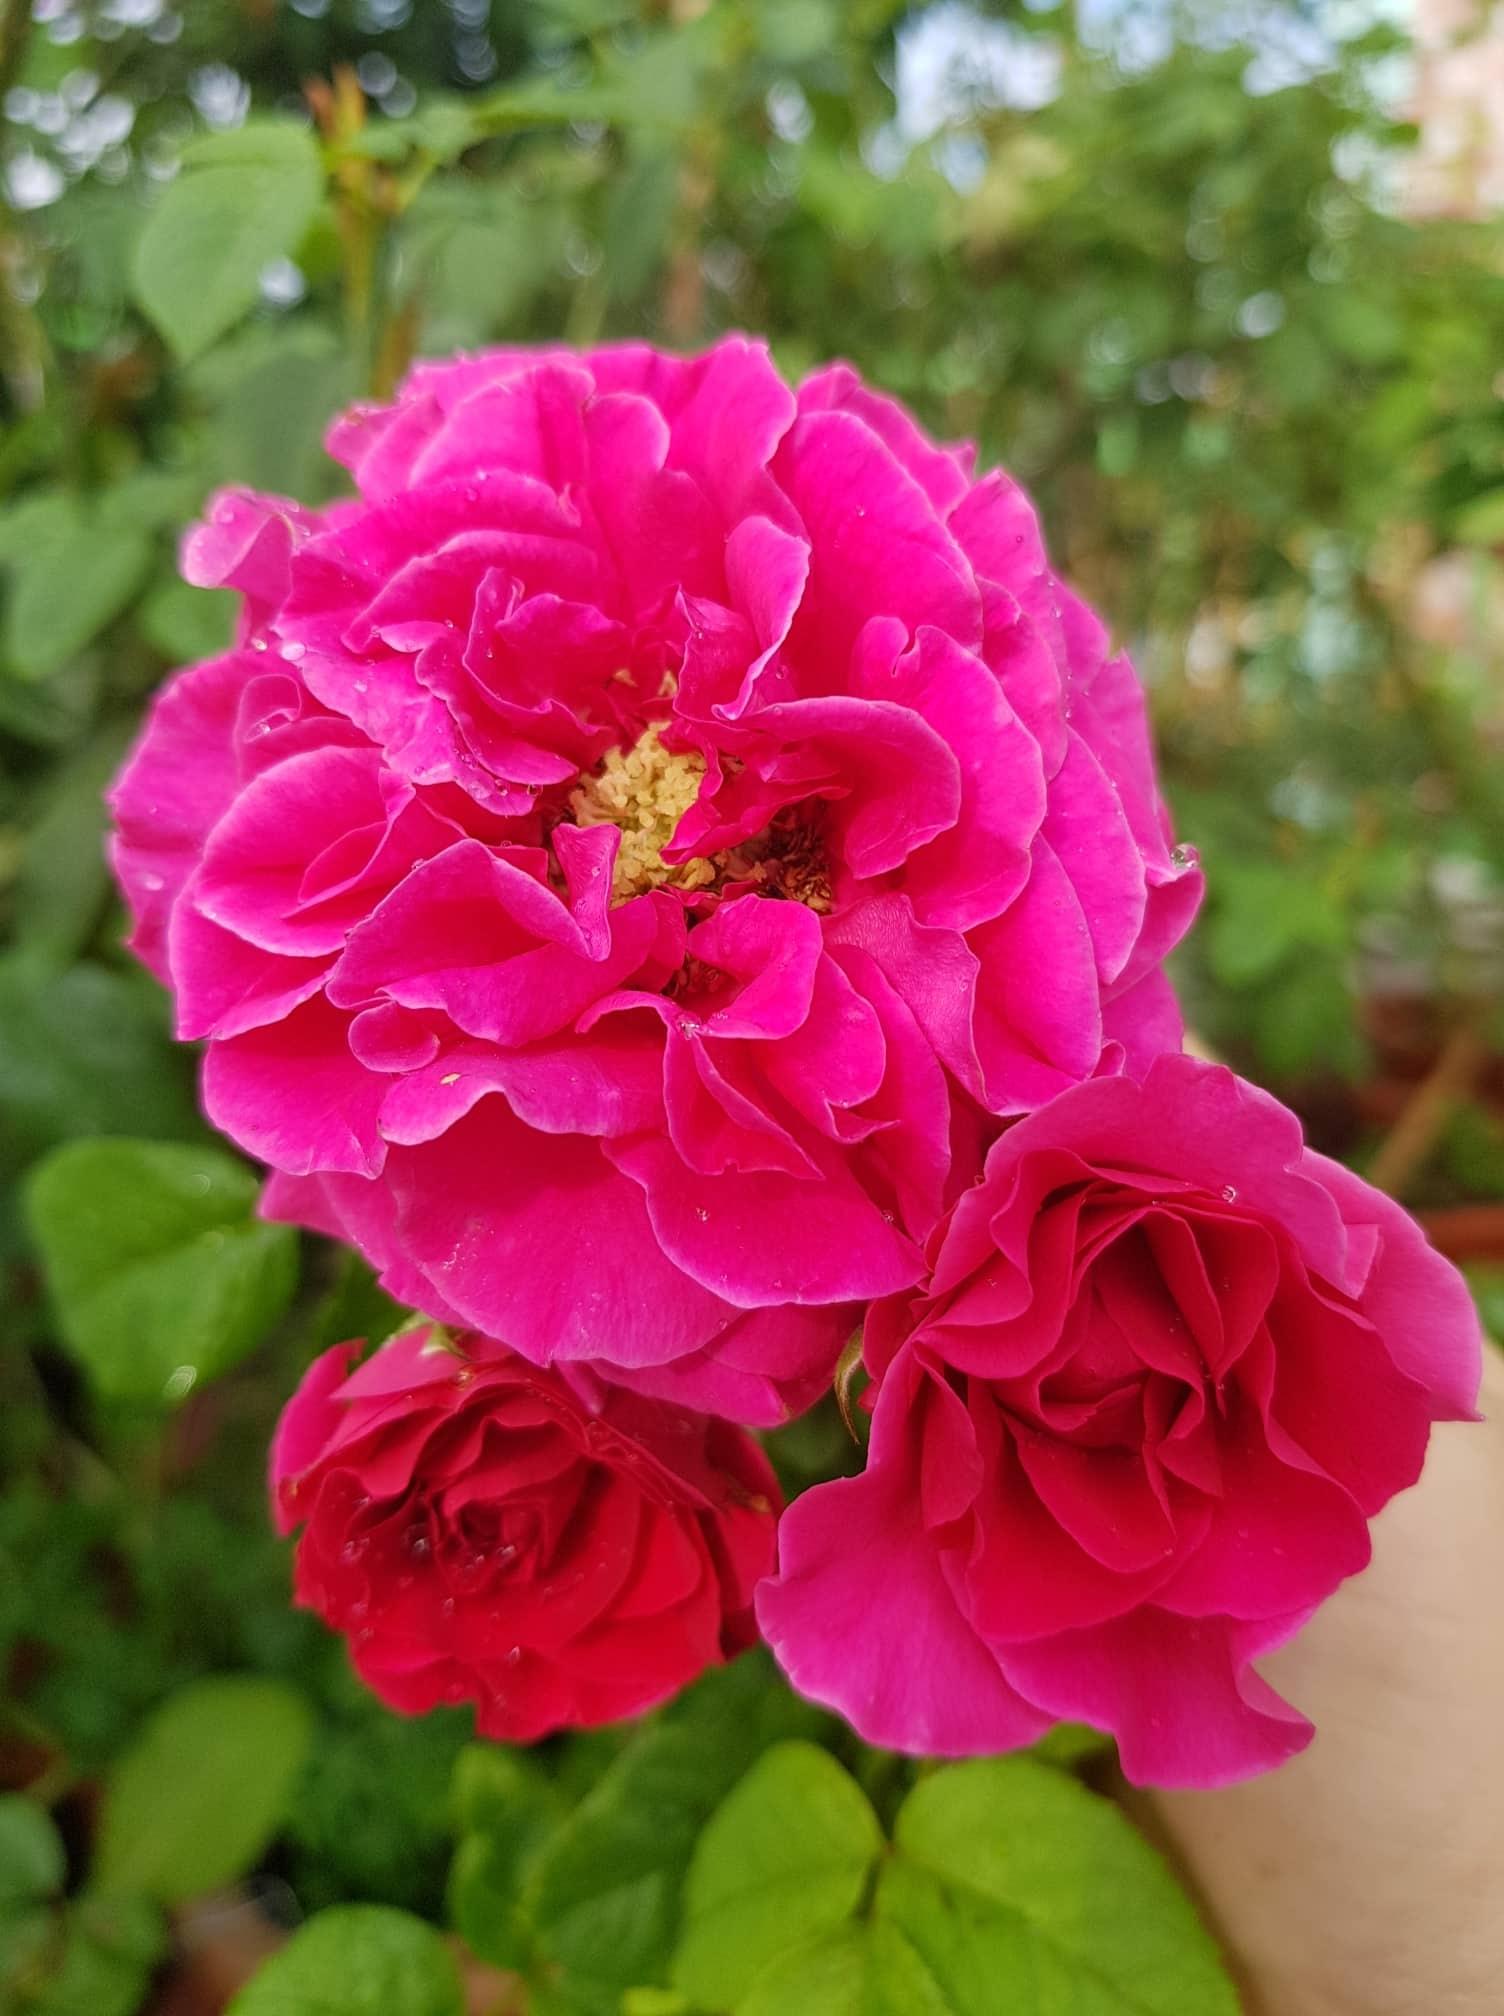 rau qua va hoa tuoi tot xanh um tren san thuong 100m2 o tp hcm